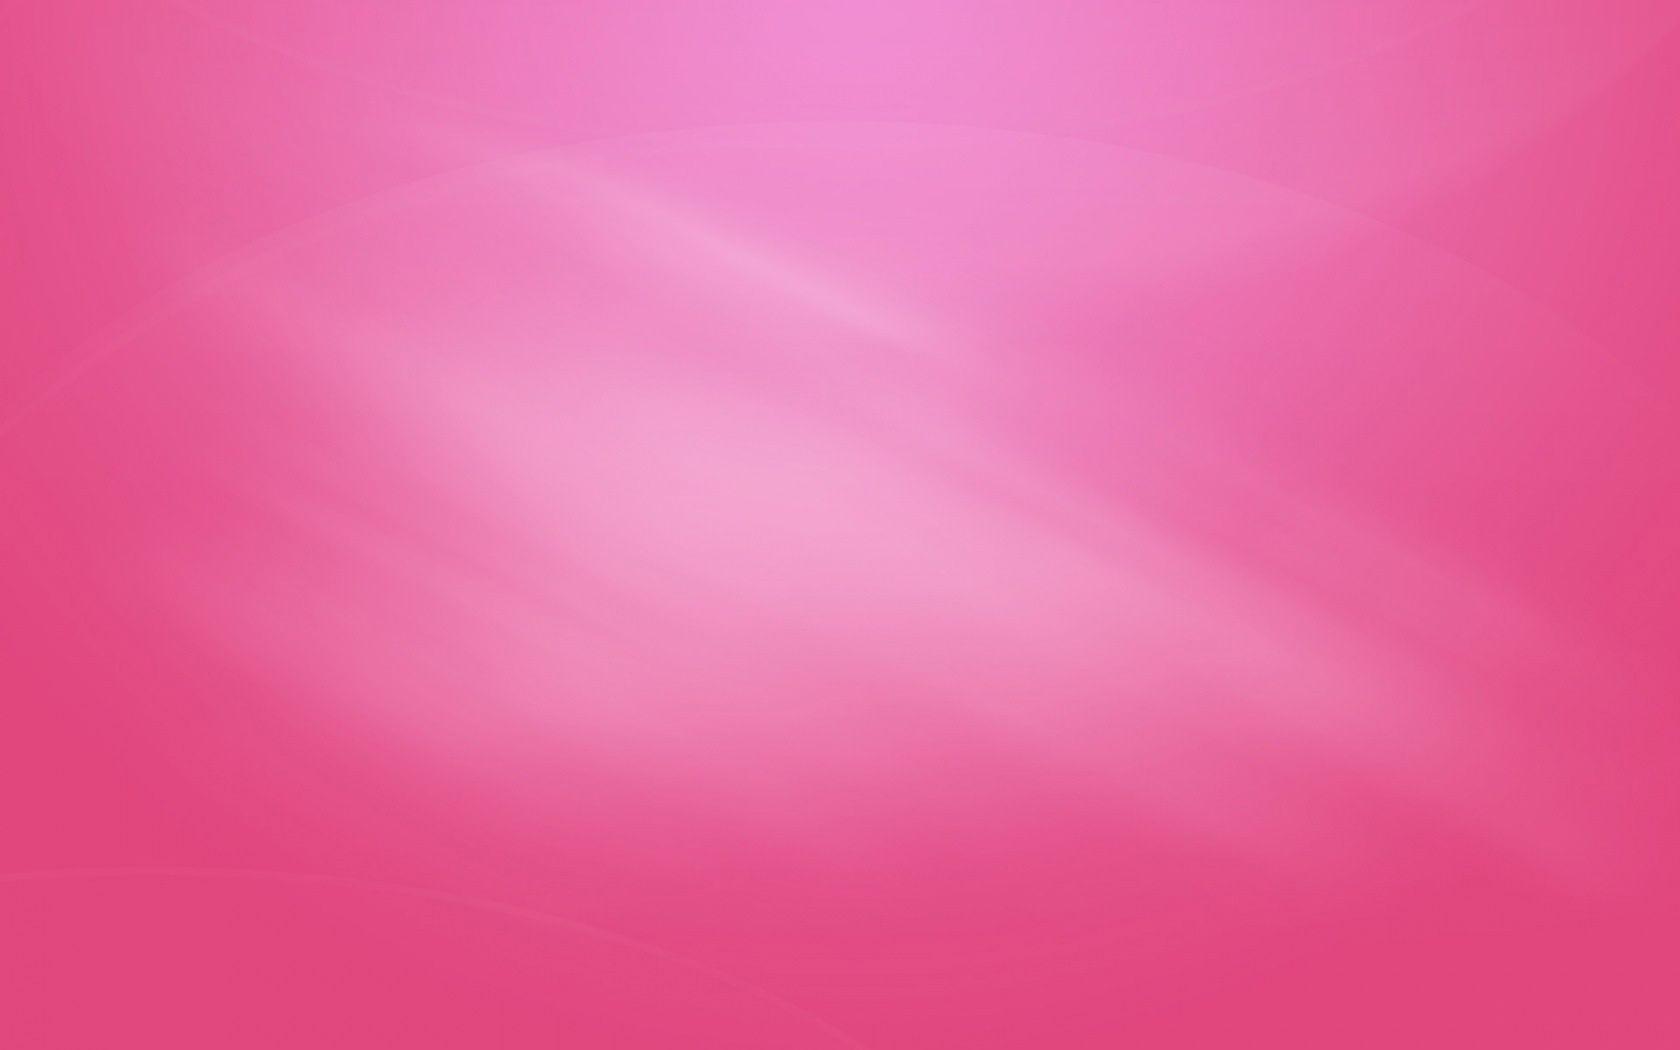 pink wallpaper city hd - photo #43